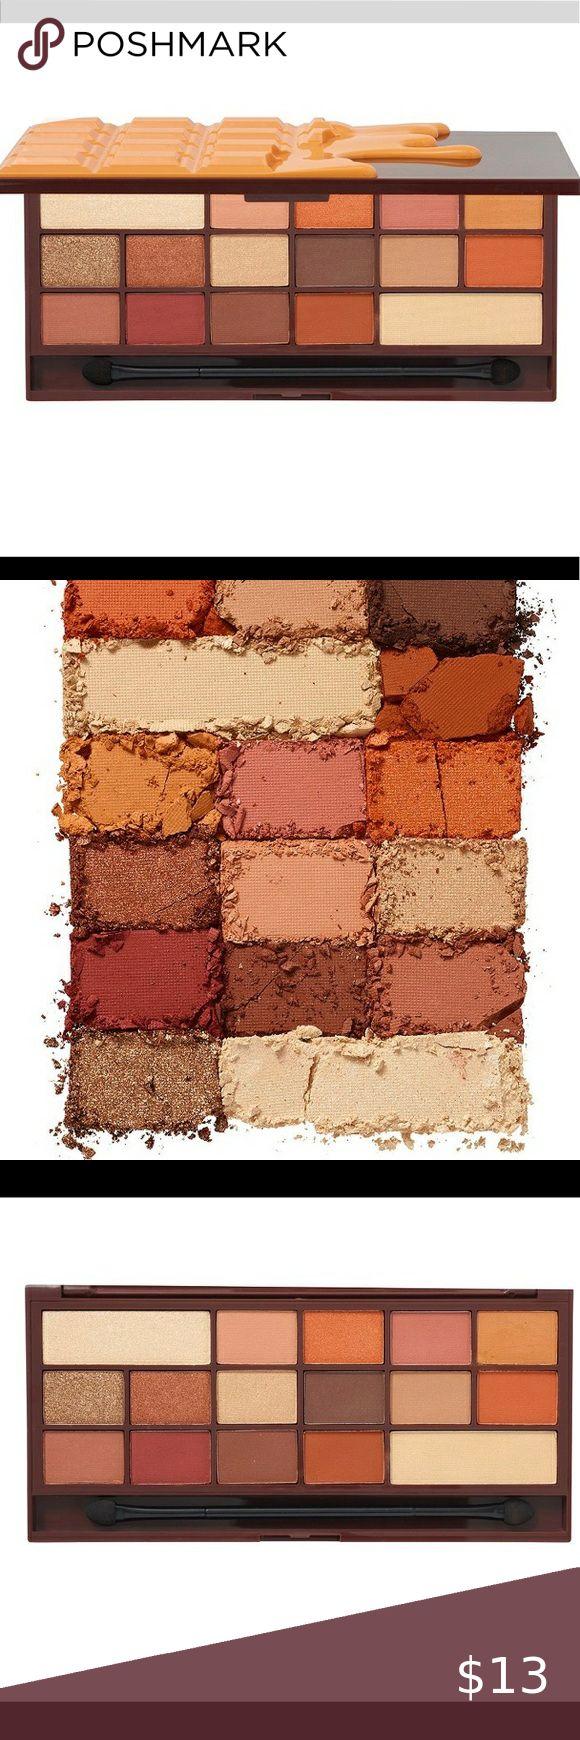 Chocolate Orange Eyeshadow Pallete Used once. Ulta